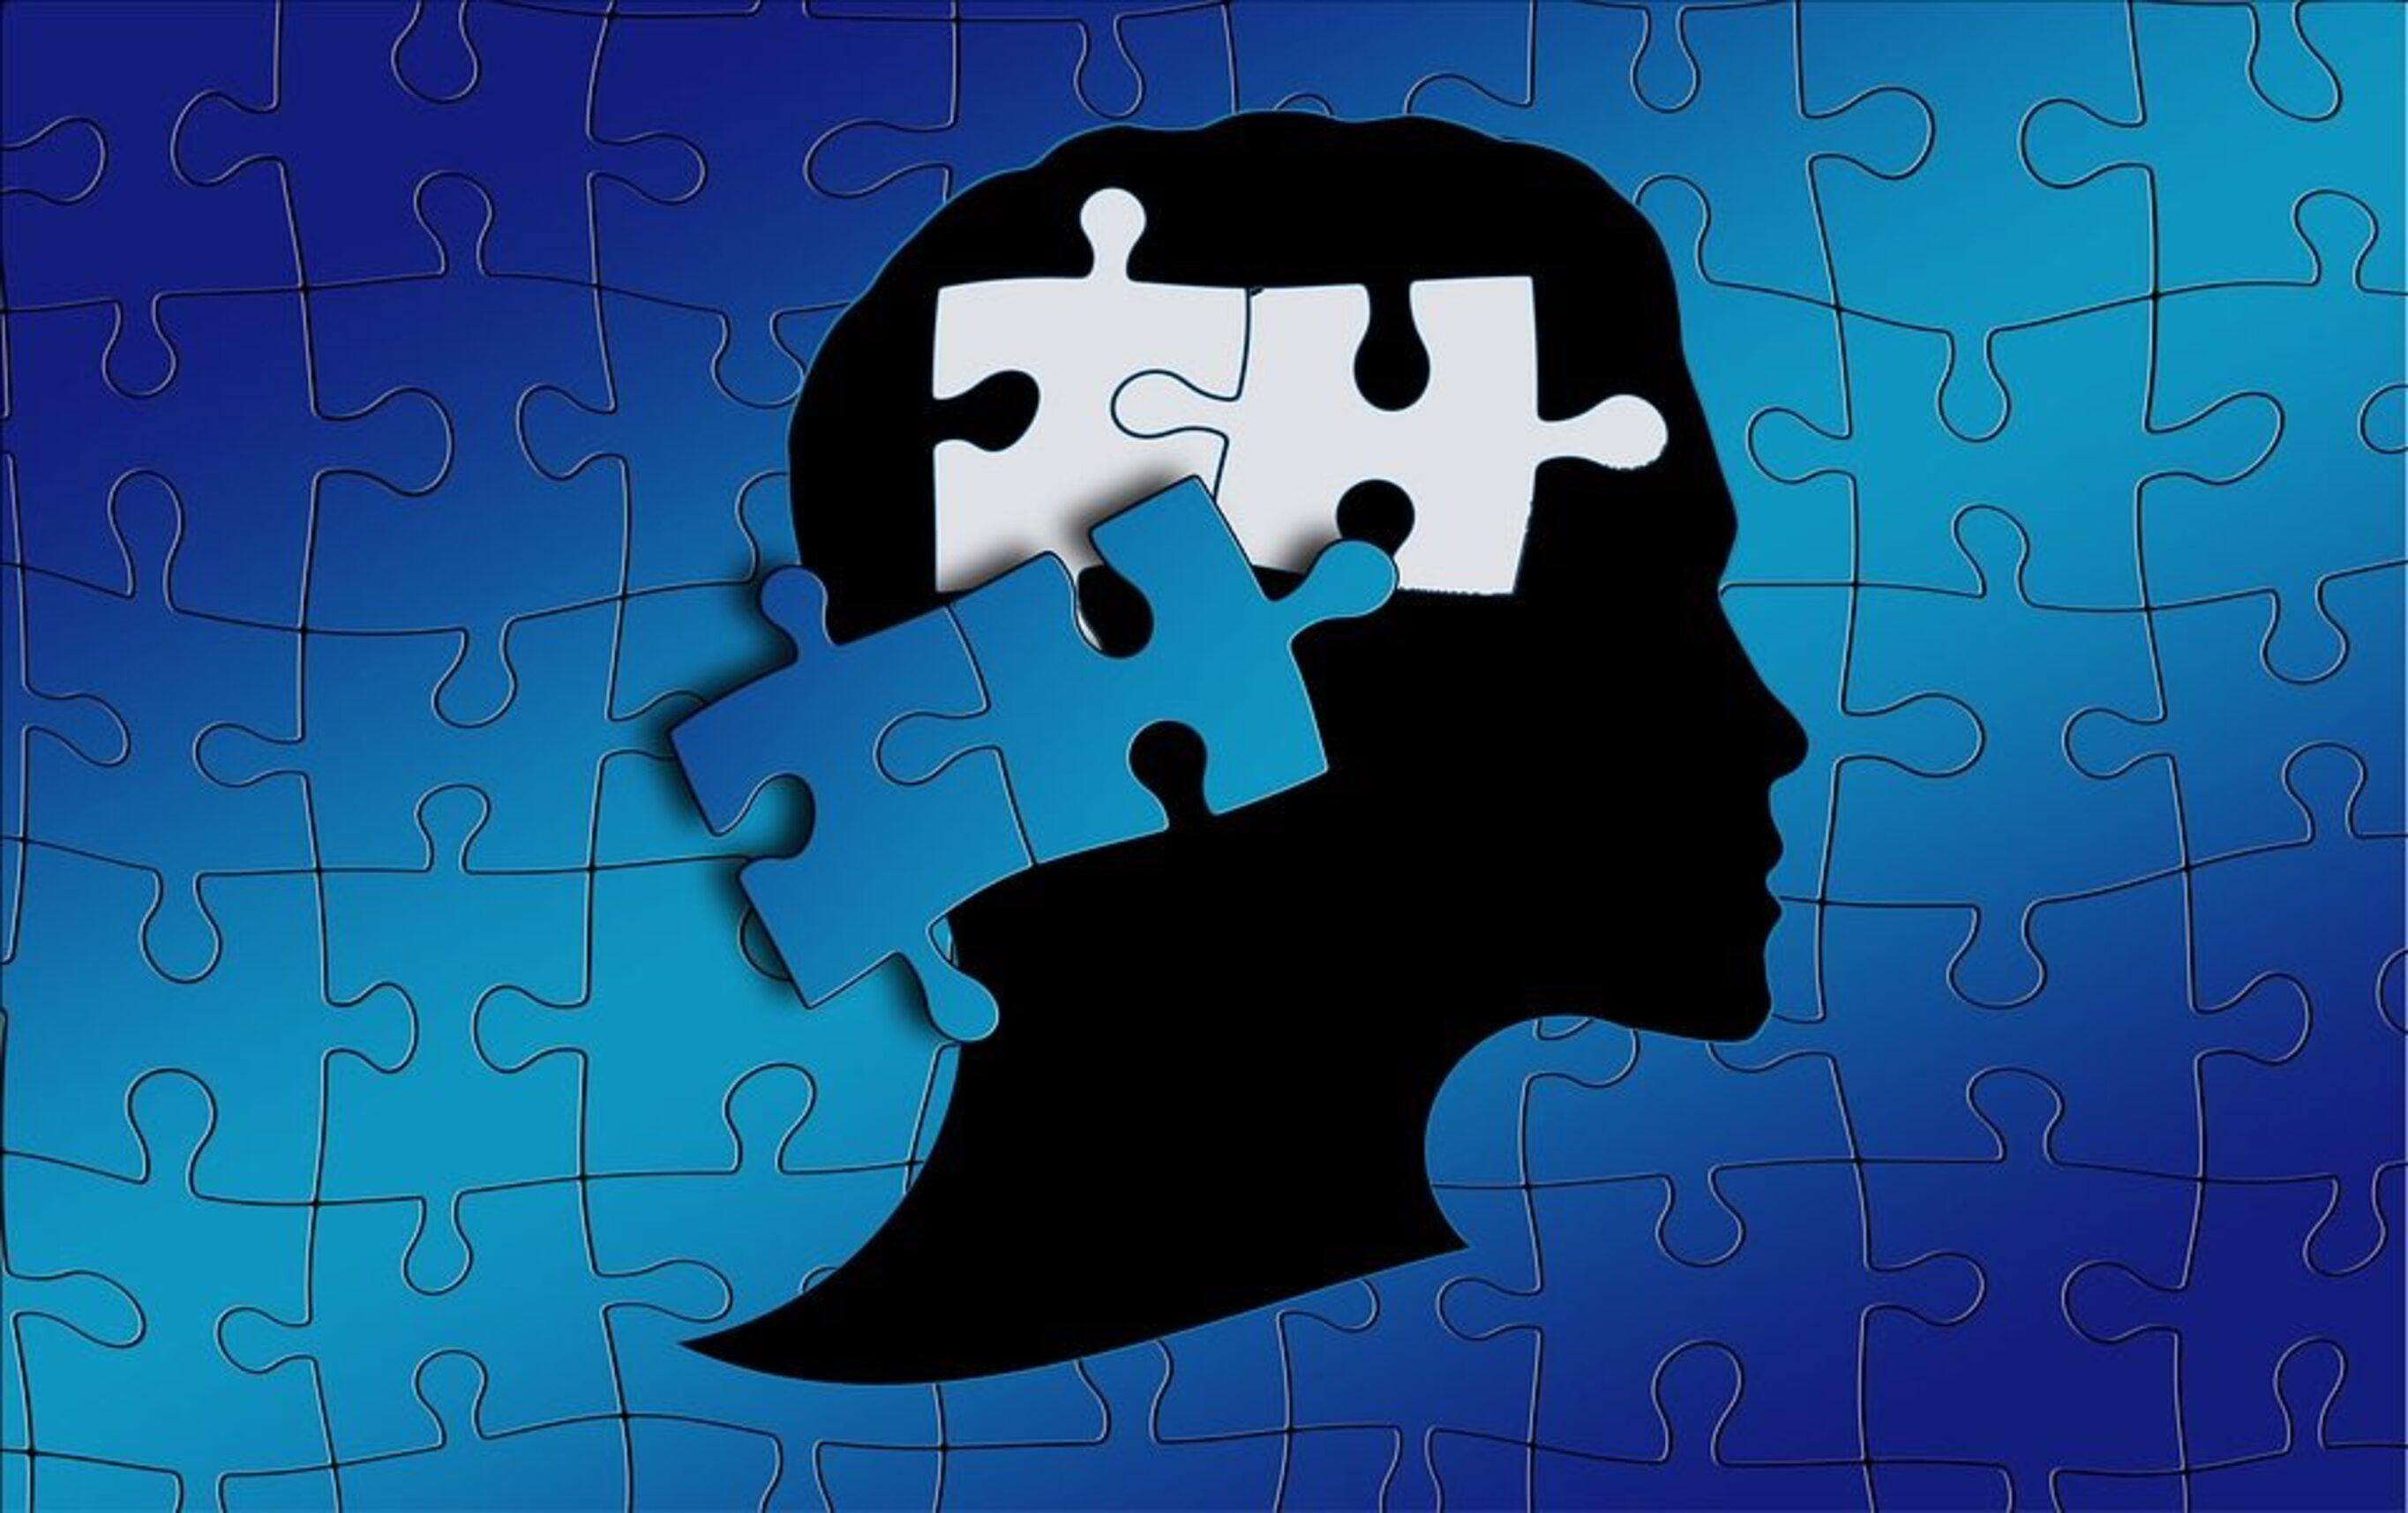 Transtorno do Espectro Autista - TEA